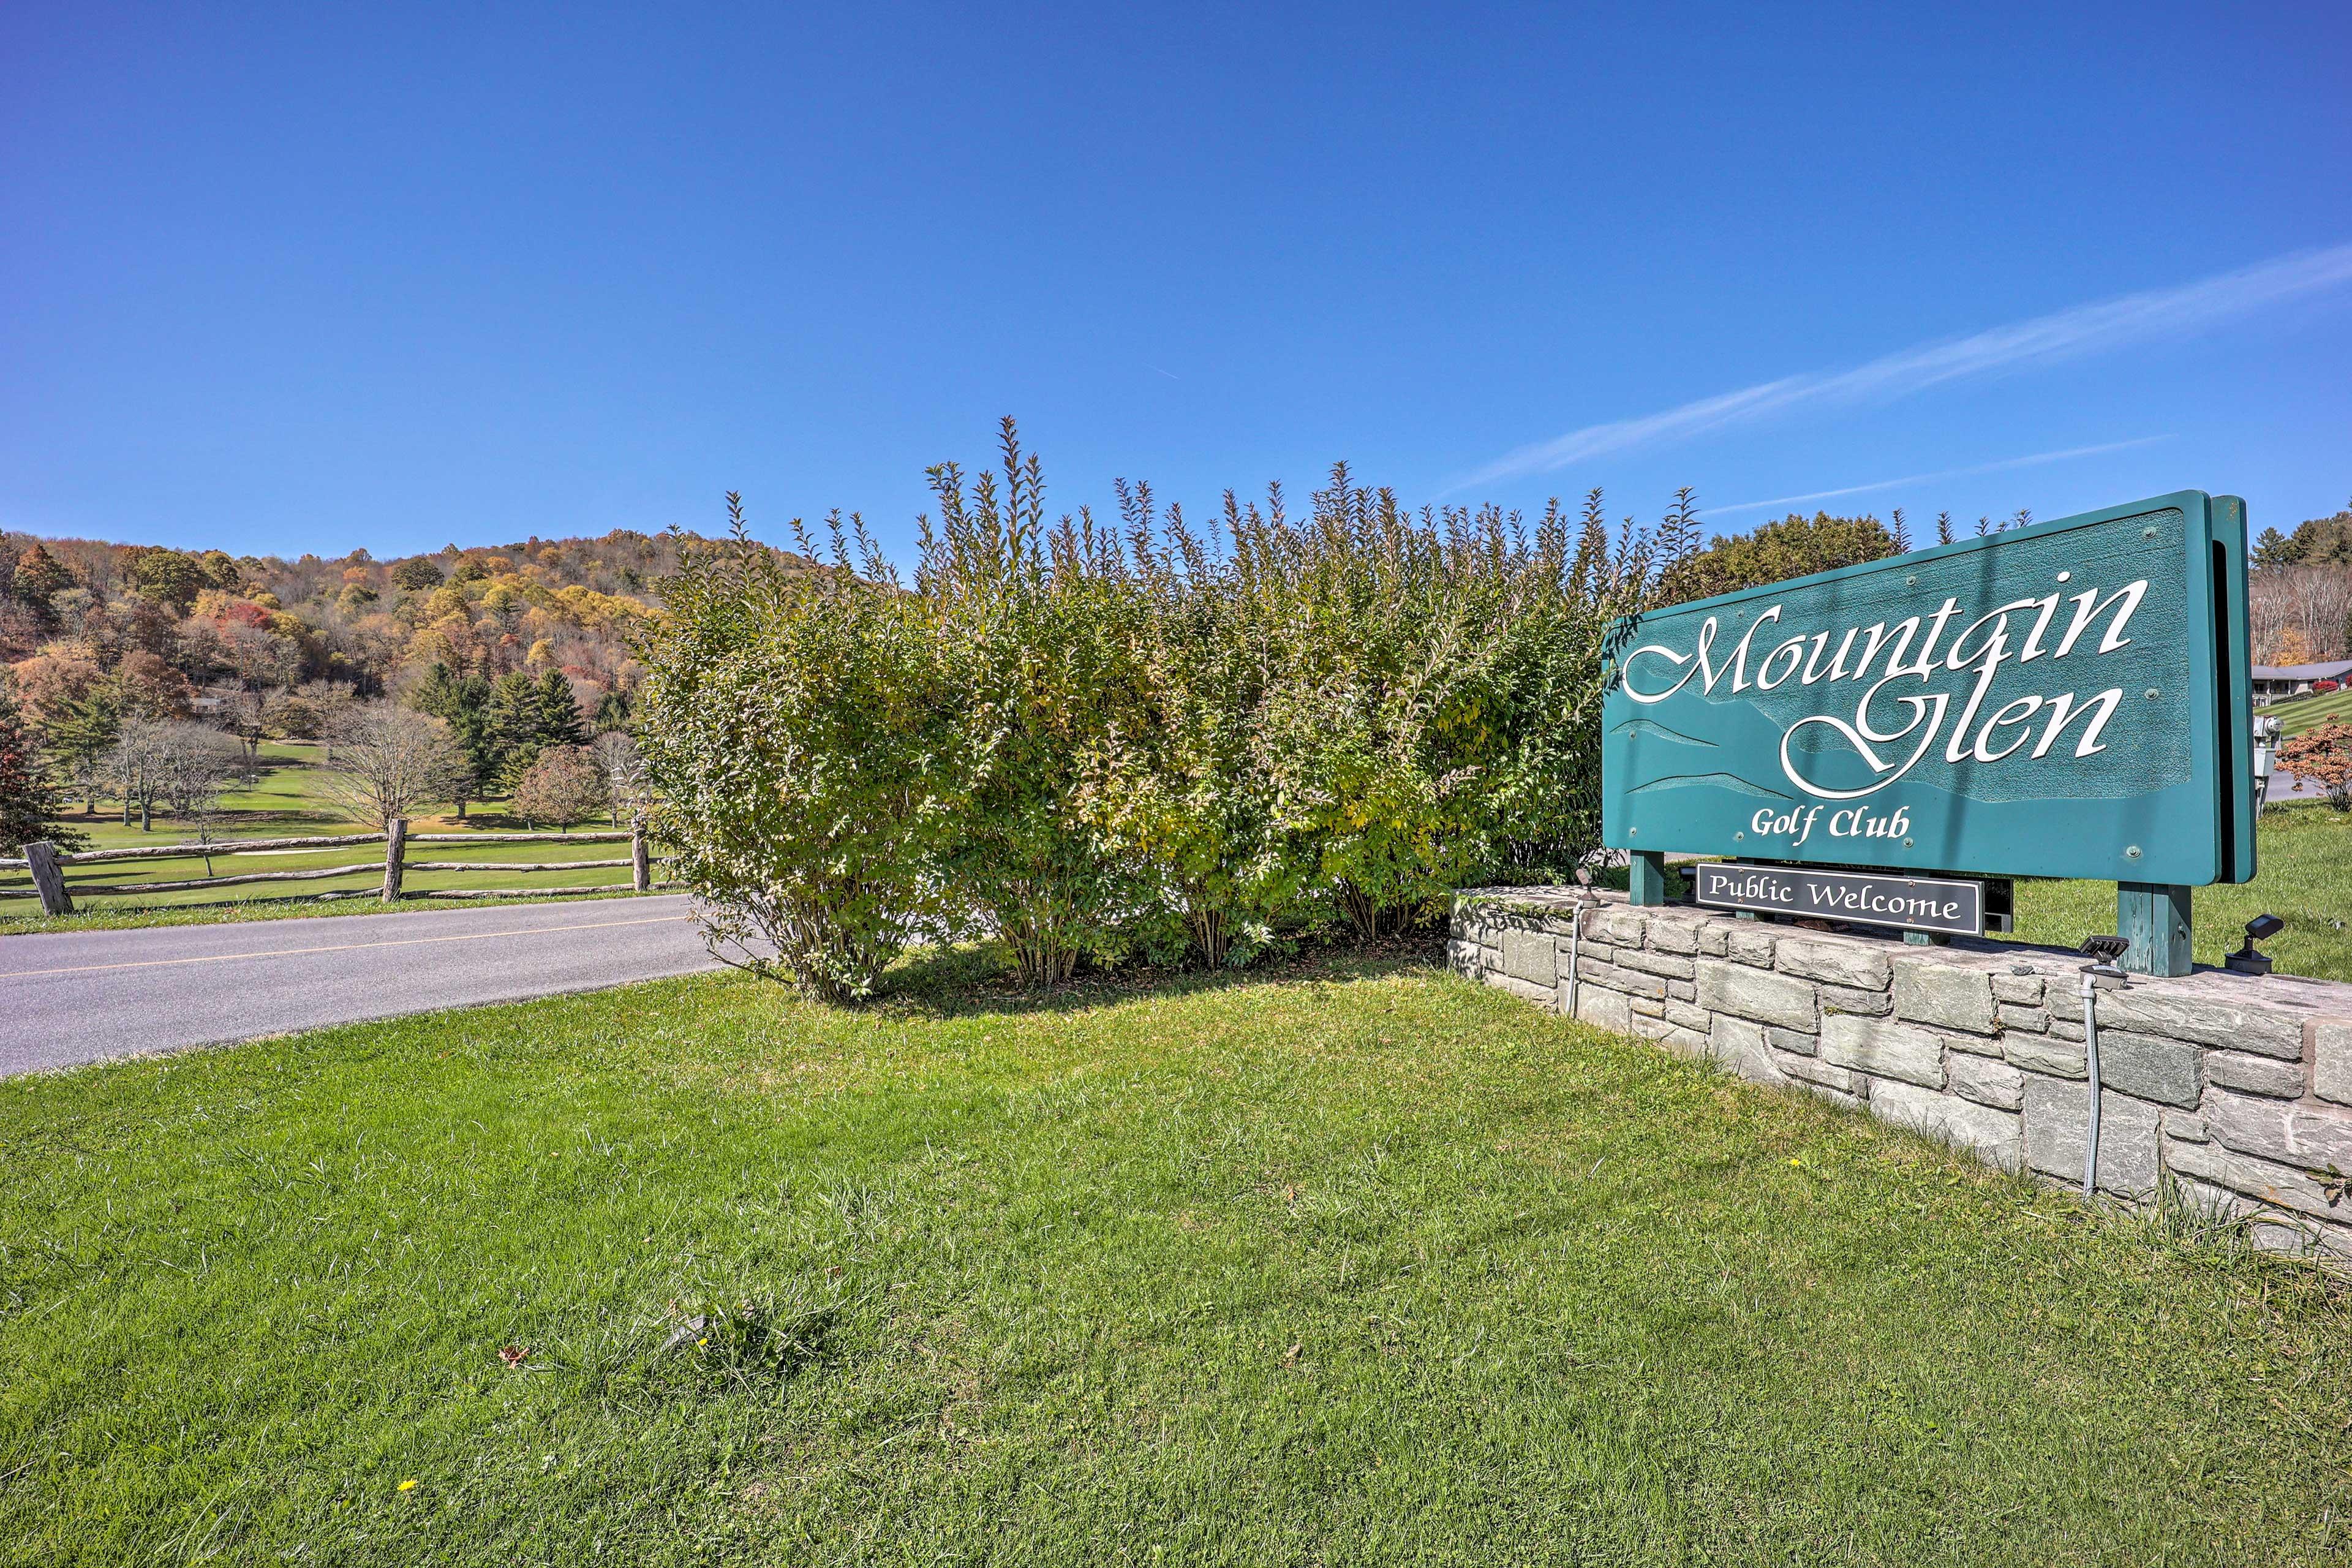 Mountain Glen Golf Club